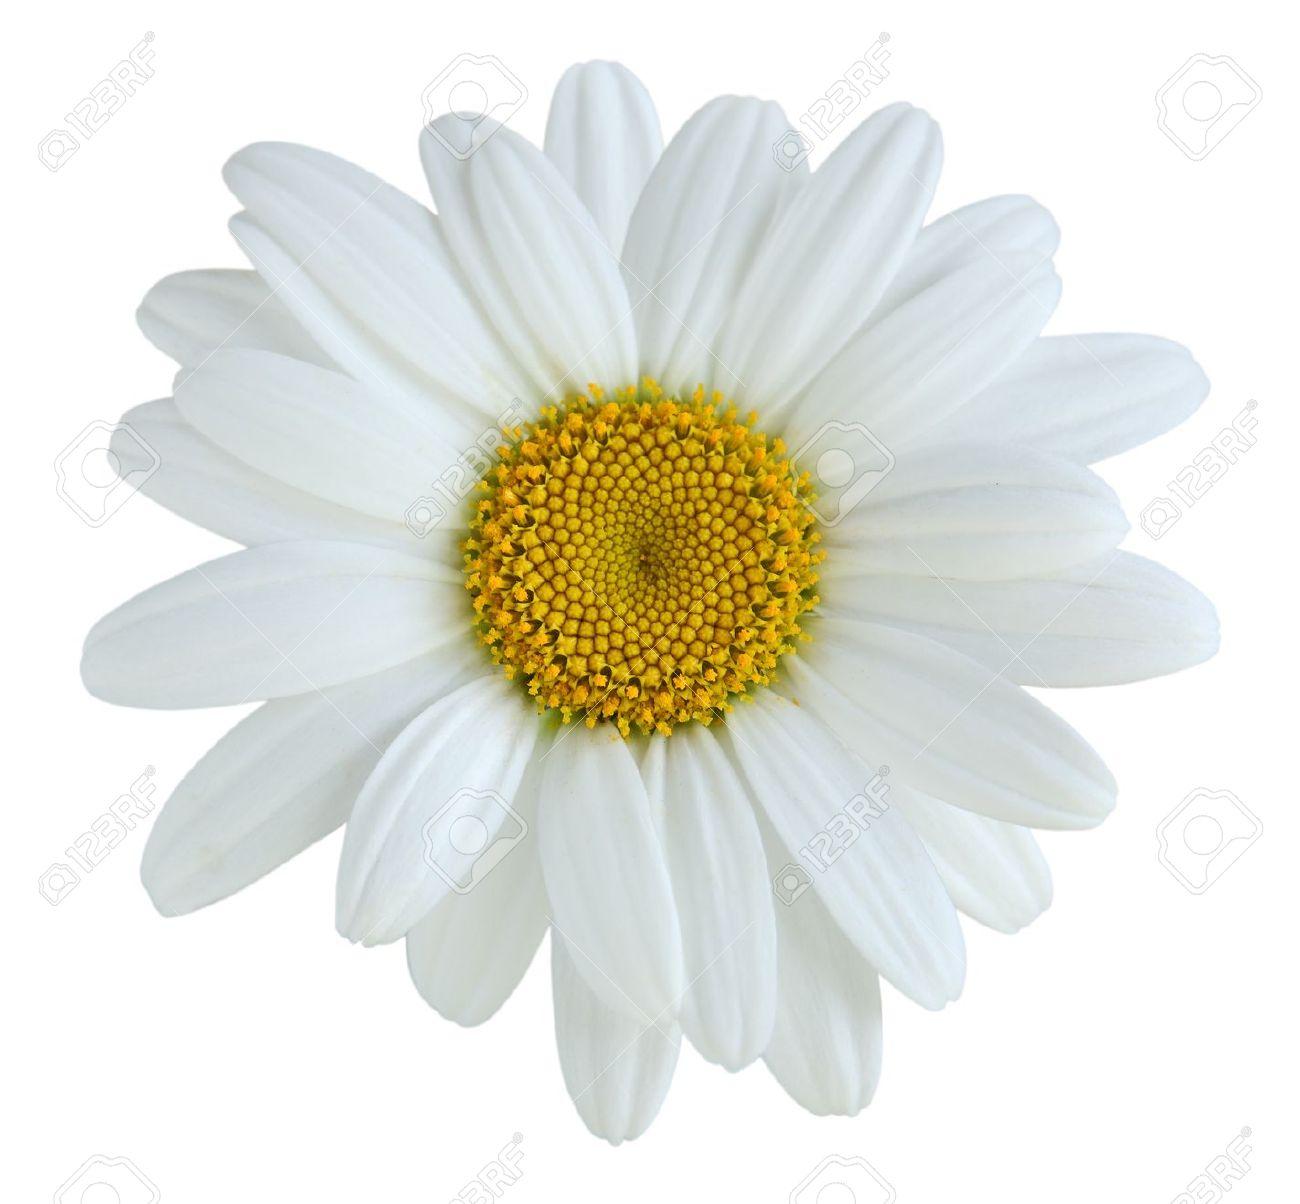 Single daisy flower isolated on white background stock photo single daisy flower isolated on white background stock photo 16568413 mightylinksfo Images